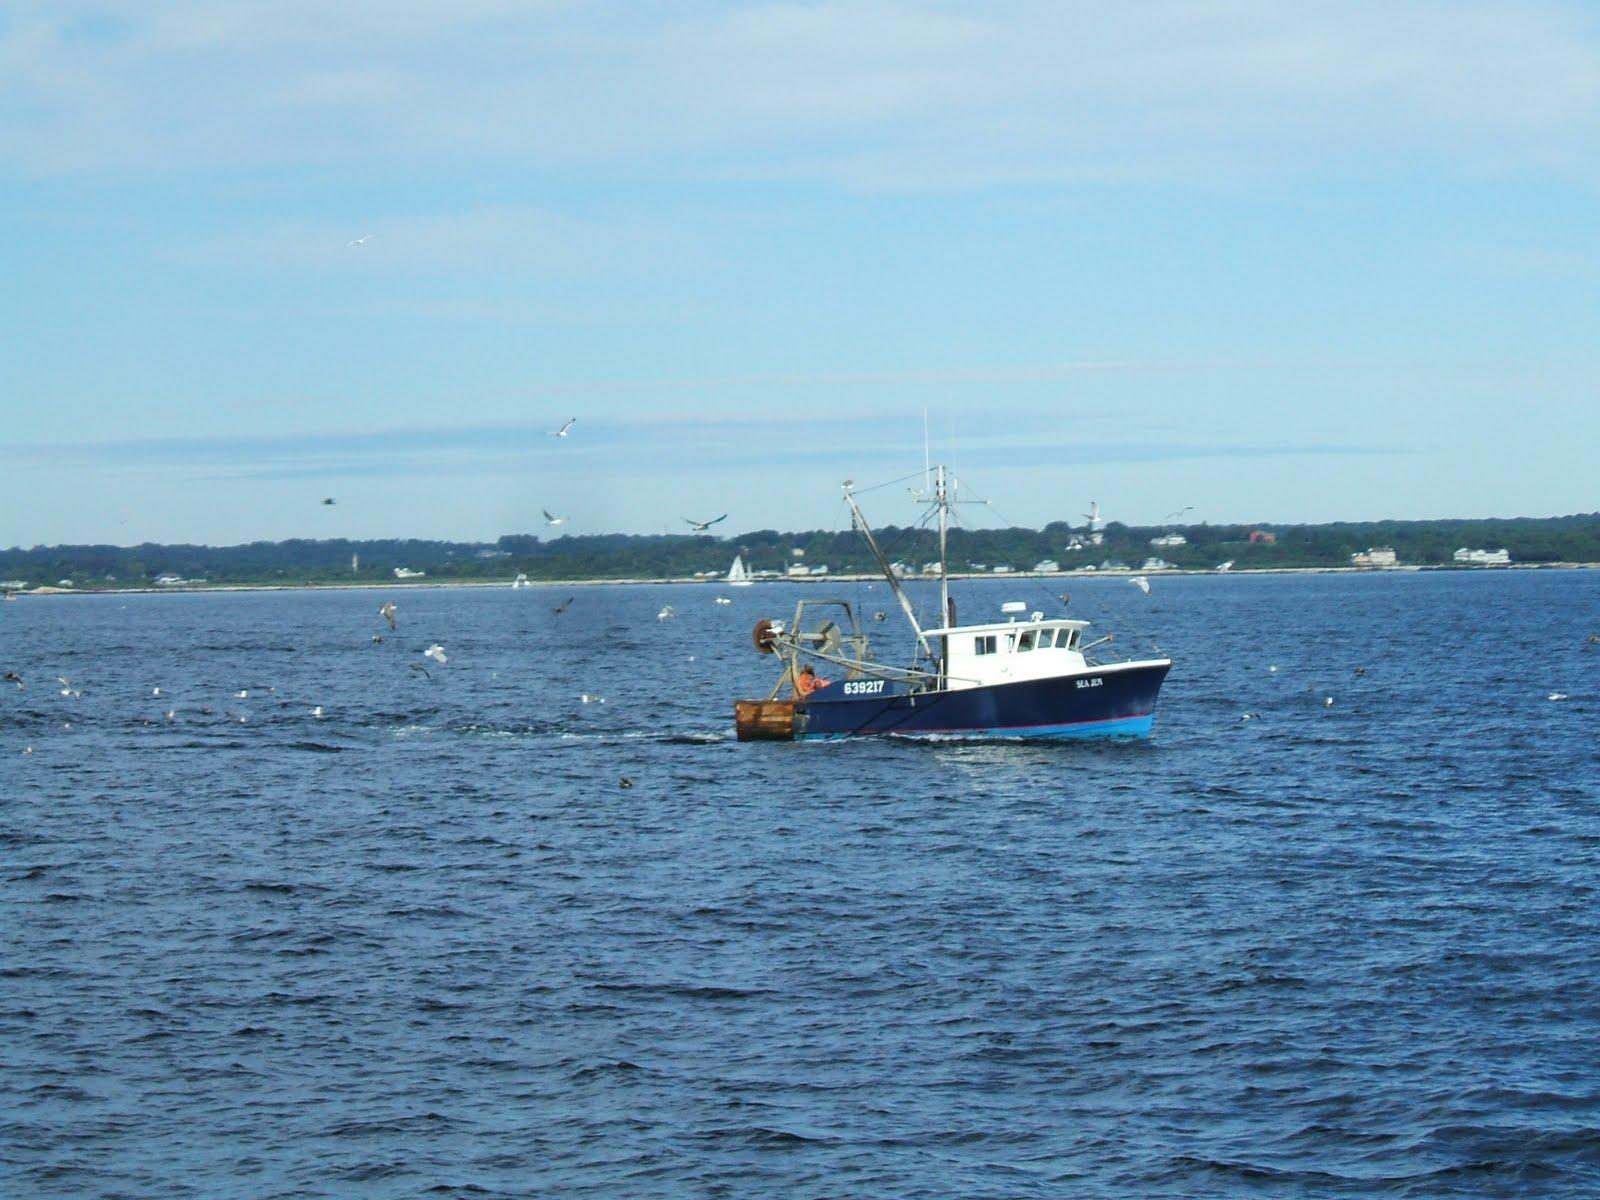 Rhode island college savings plans of bank savings for Fishing in rhode island